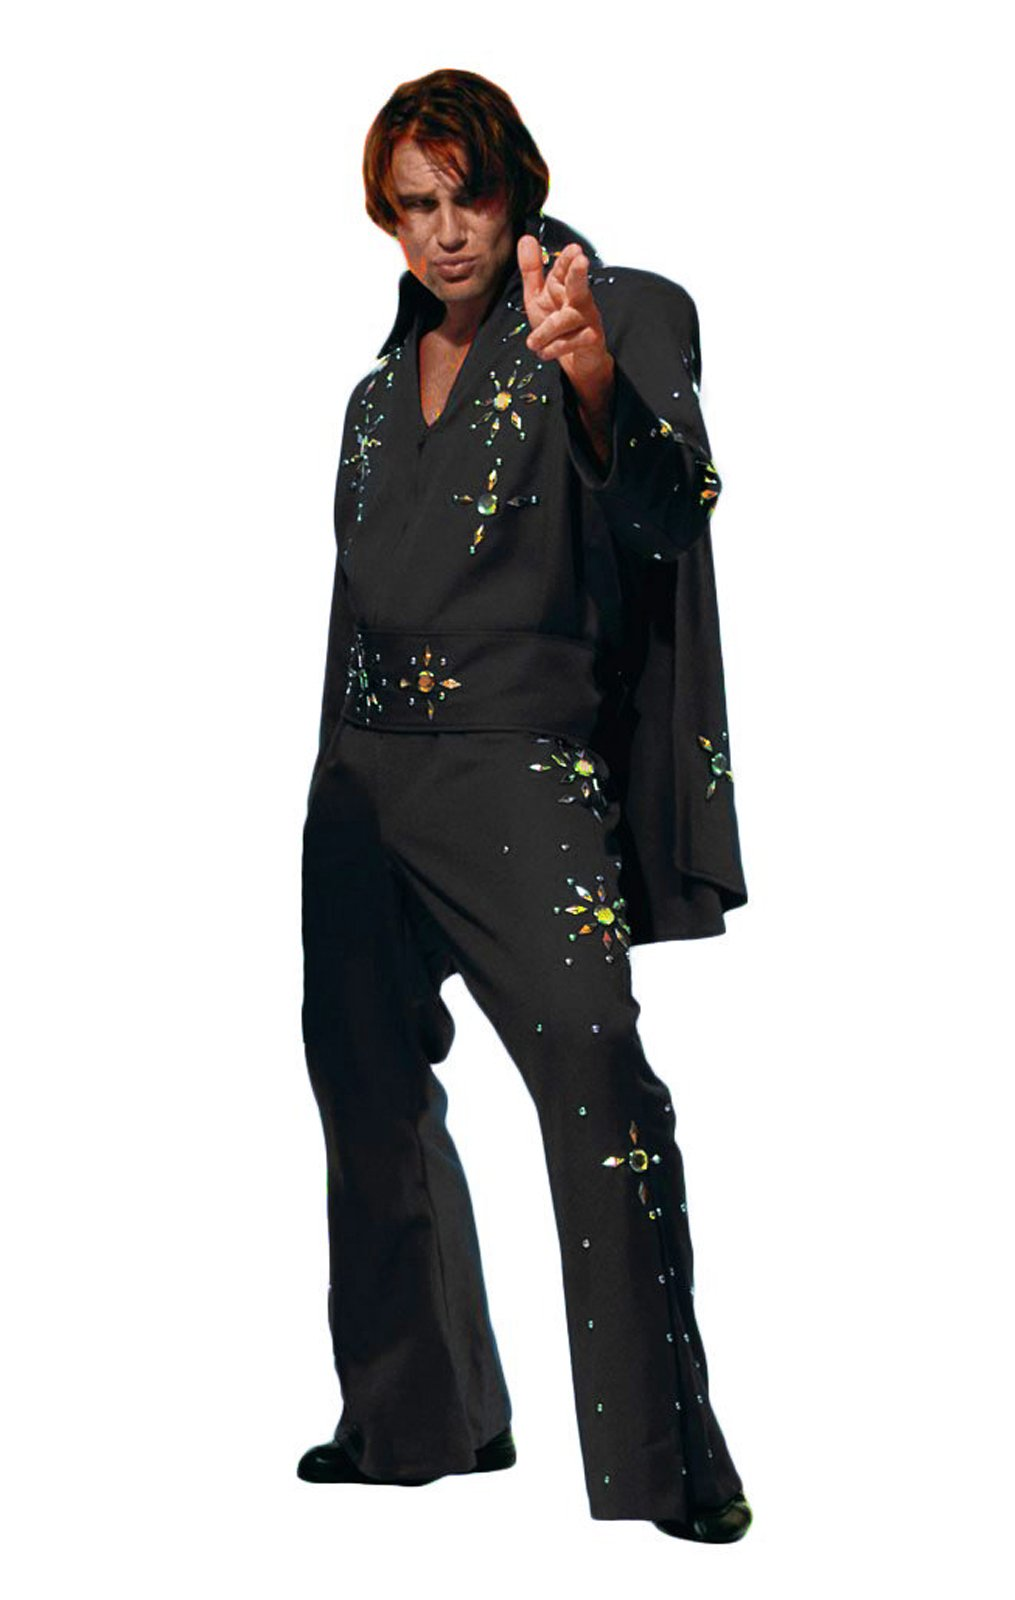 Men's Elvis Presley Deluxe Jumpsuit Costume with Cape (XL, Black (Red Stones))